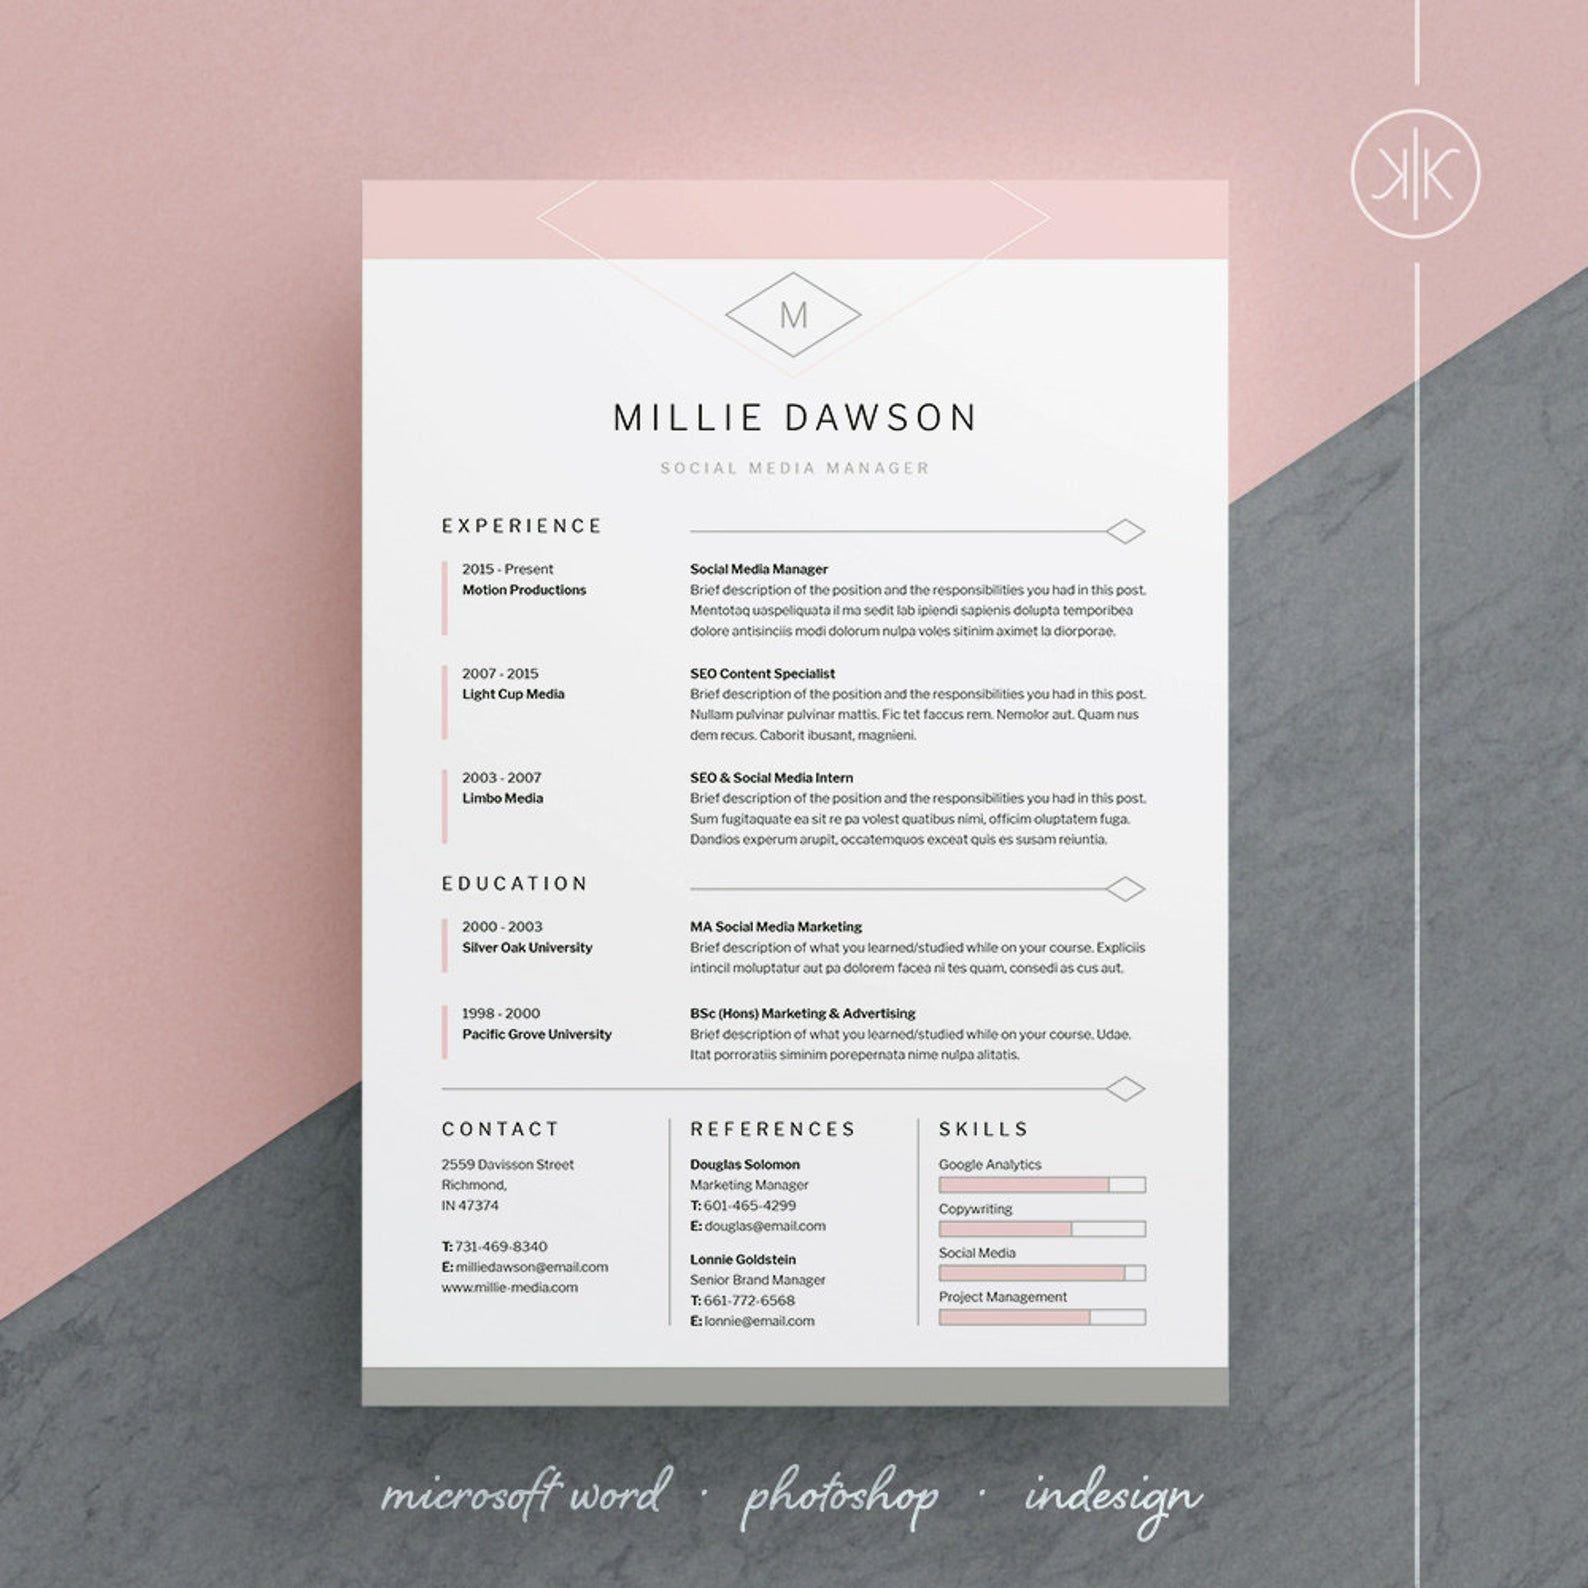 Millie Resume Cv Template Word Photoshop Indesign Etsy Cv Template Word Indesign Resume Template Resume Design Professional